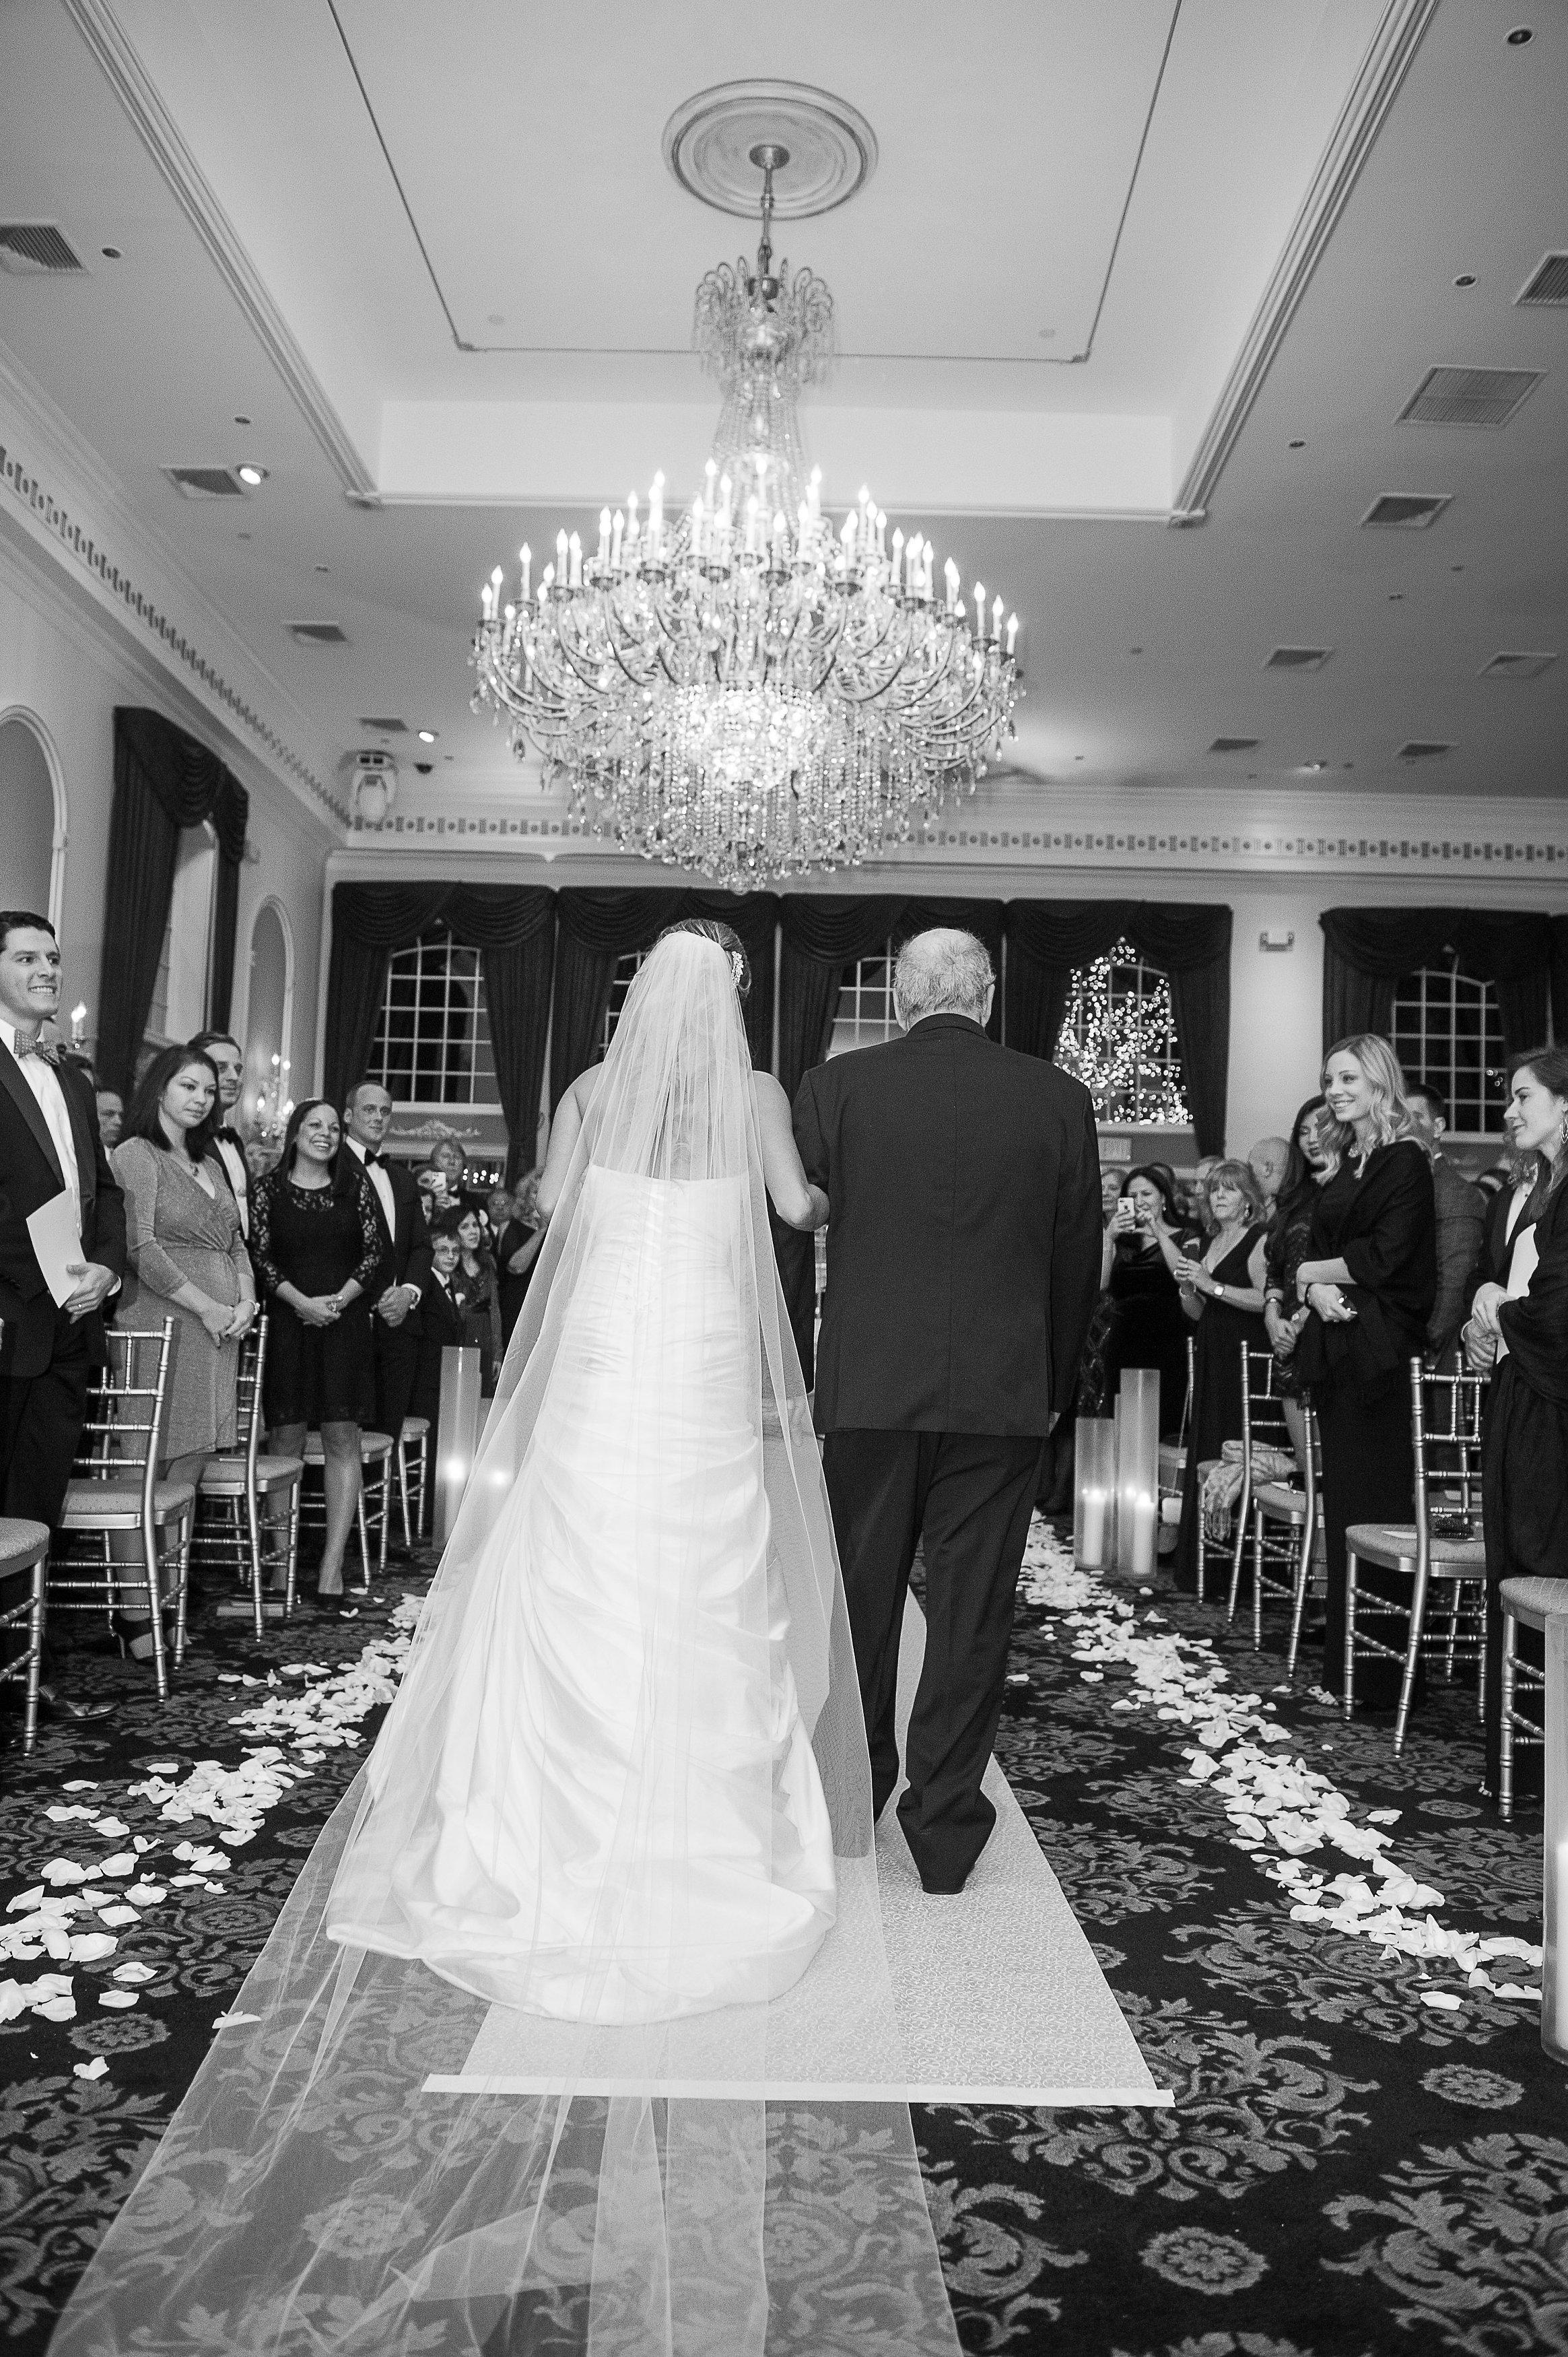 Ceci_New_York_Custom_Invitation_ New_Jersey_Wedding_Luxury_Personalized_Ceci_Style_Bride_Foil_Stamping108.JPG